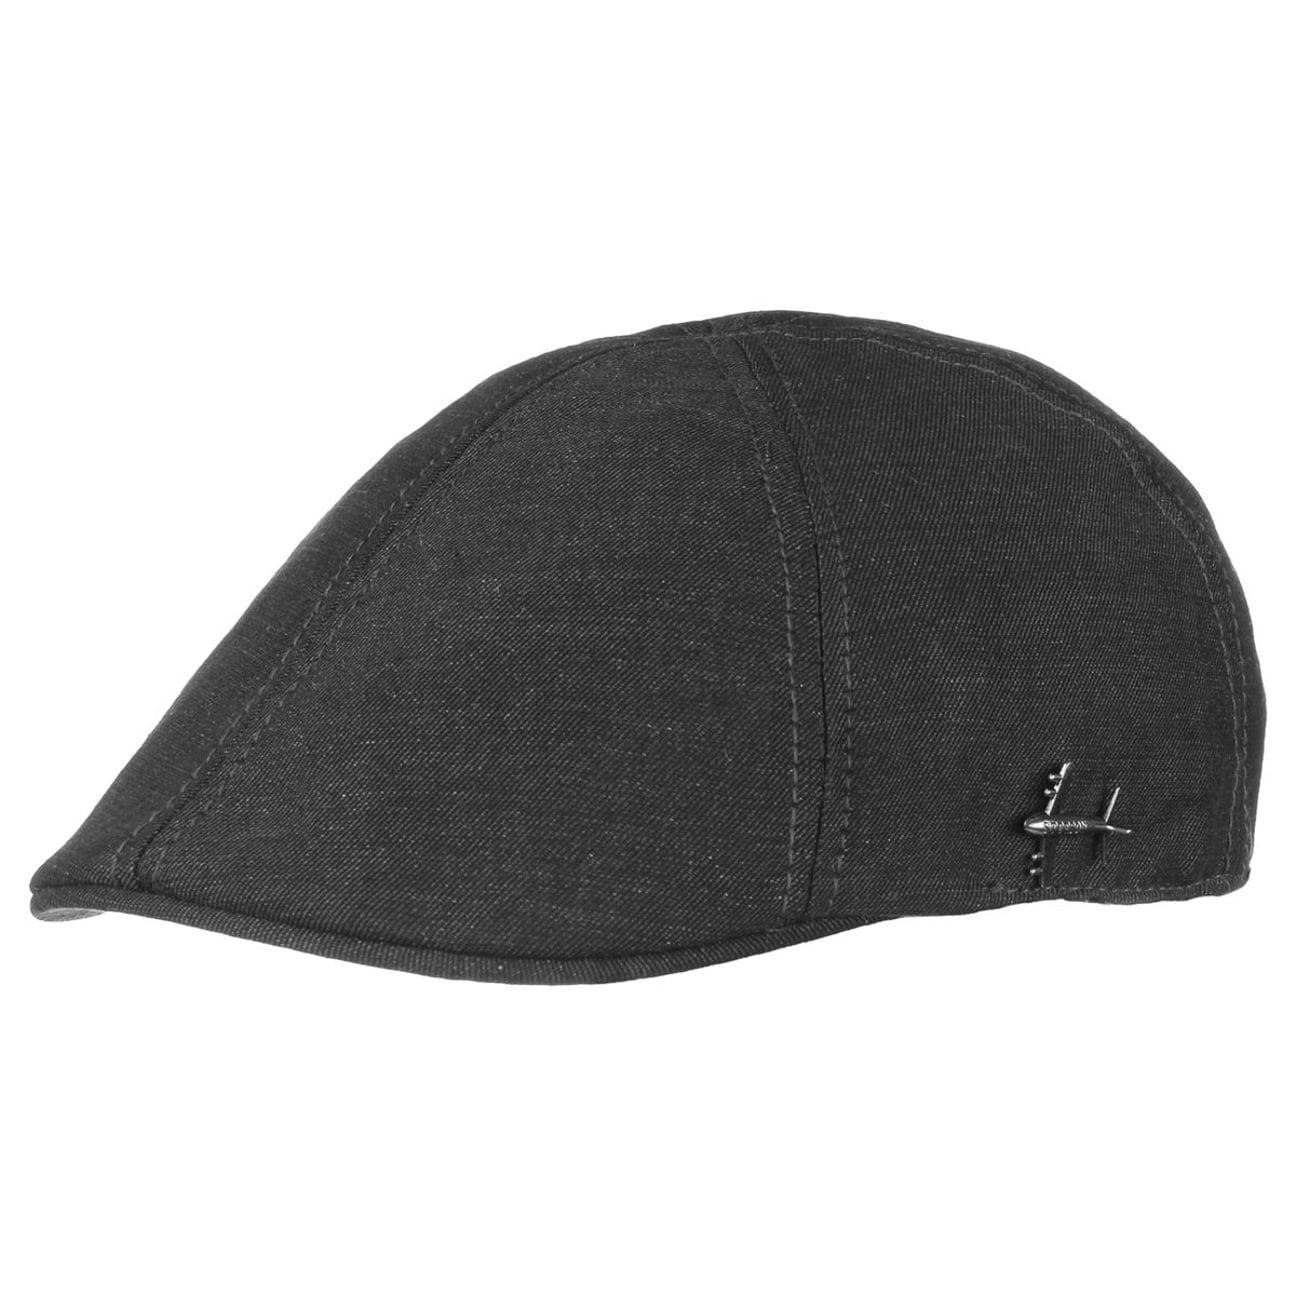 e21d1e608fabd ... Cotton Texas Linen Flat Cap by Stetson - black 5